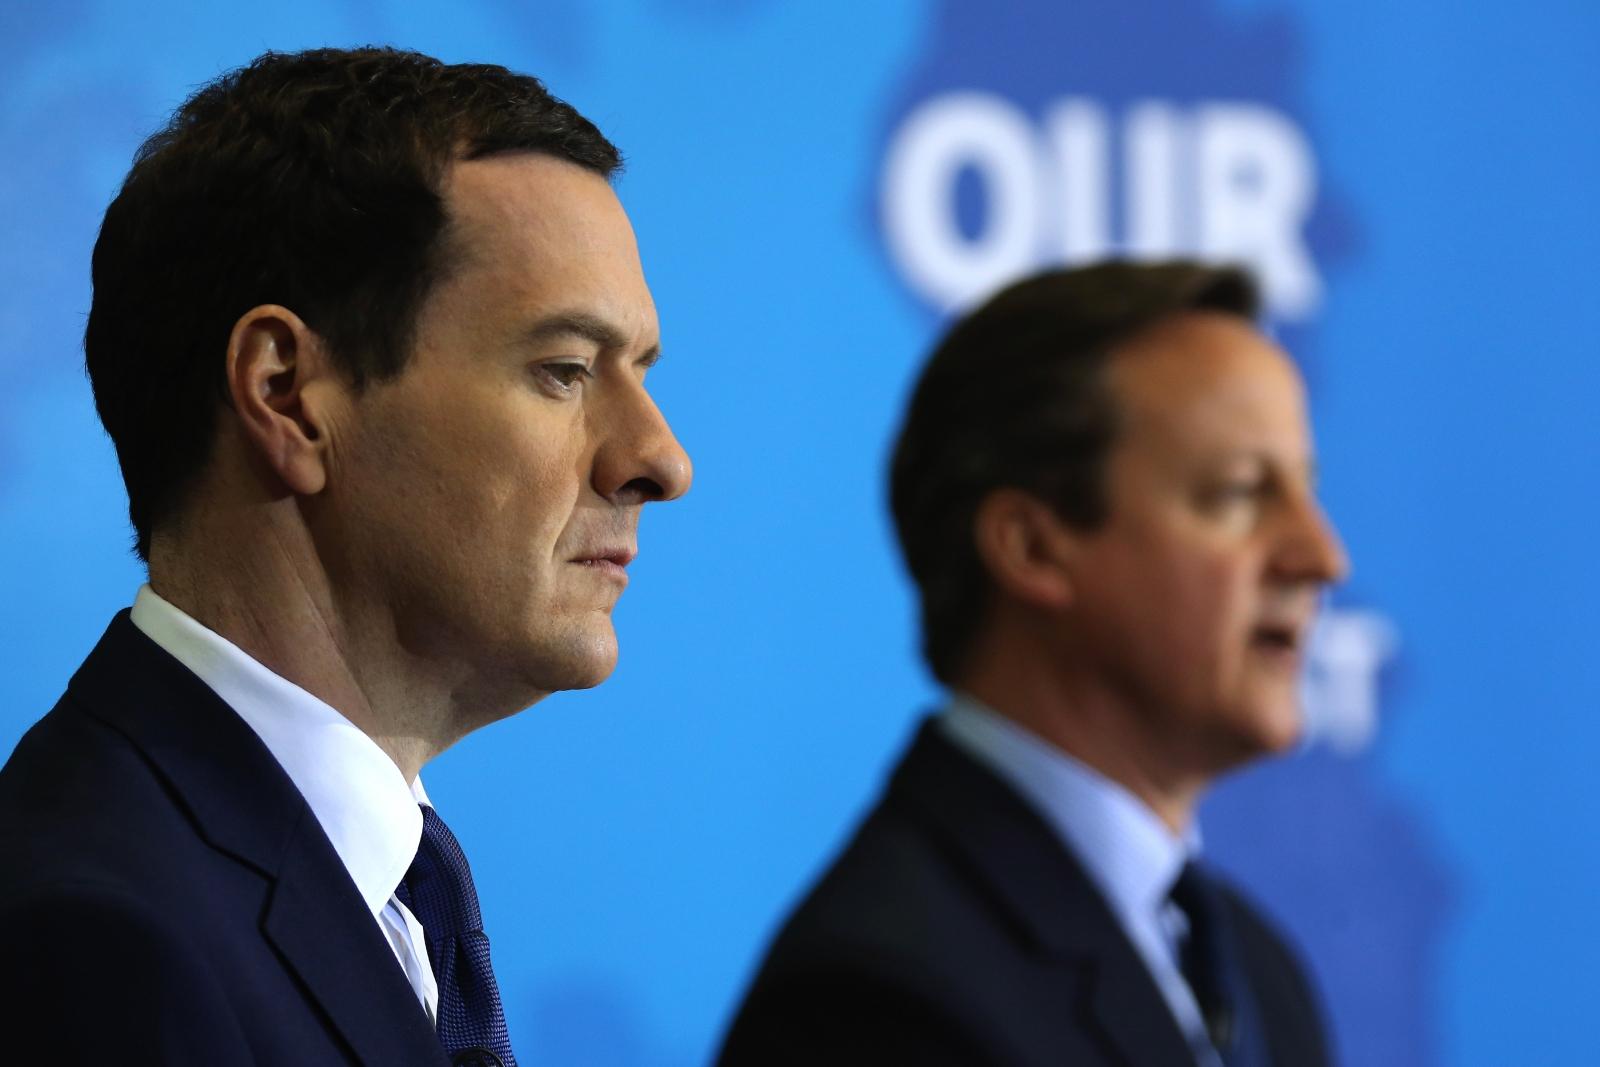 George Osborne and David Cameron